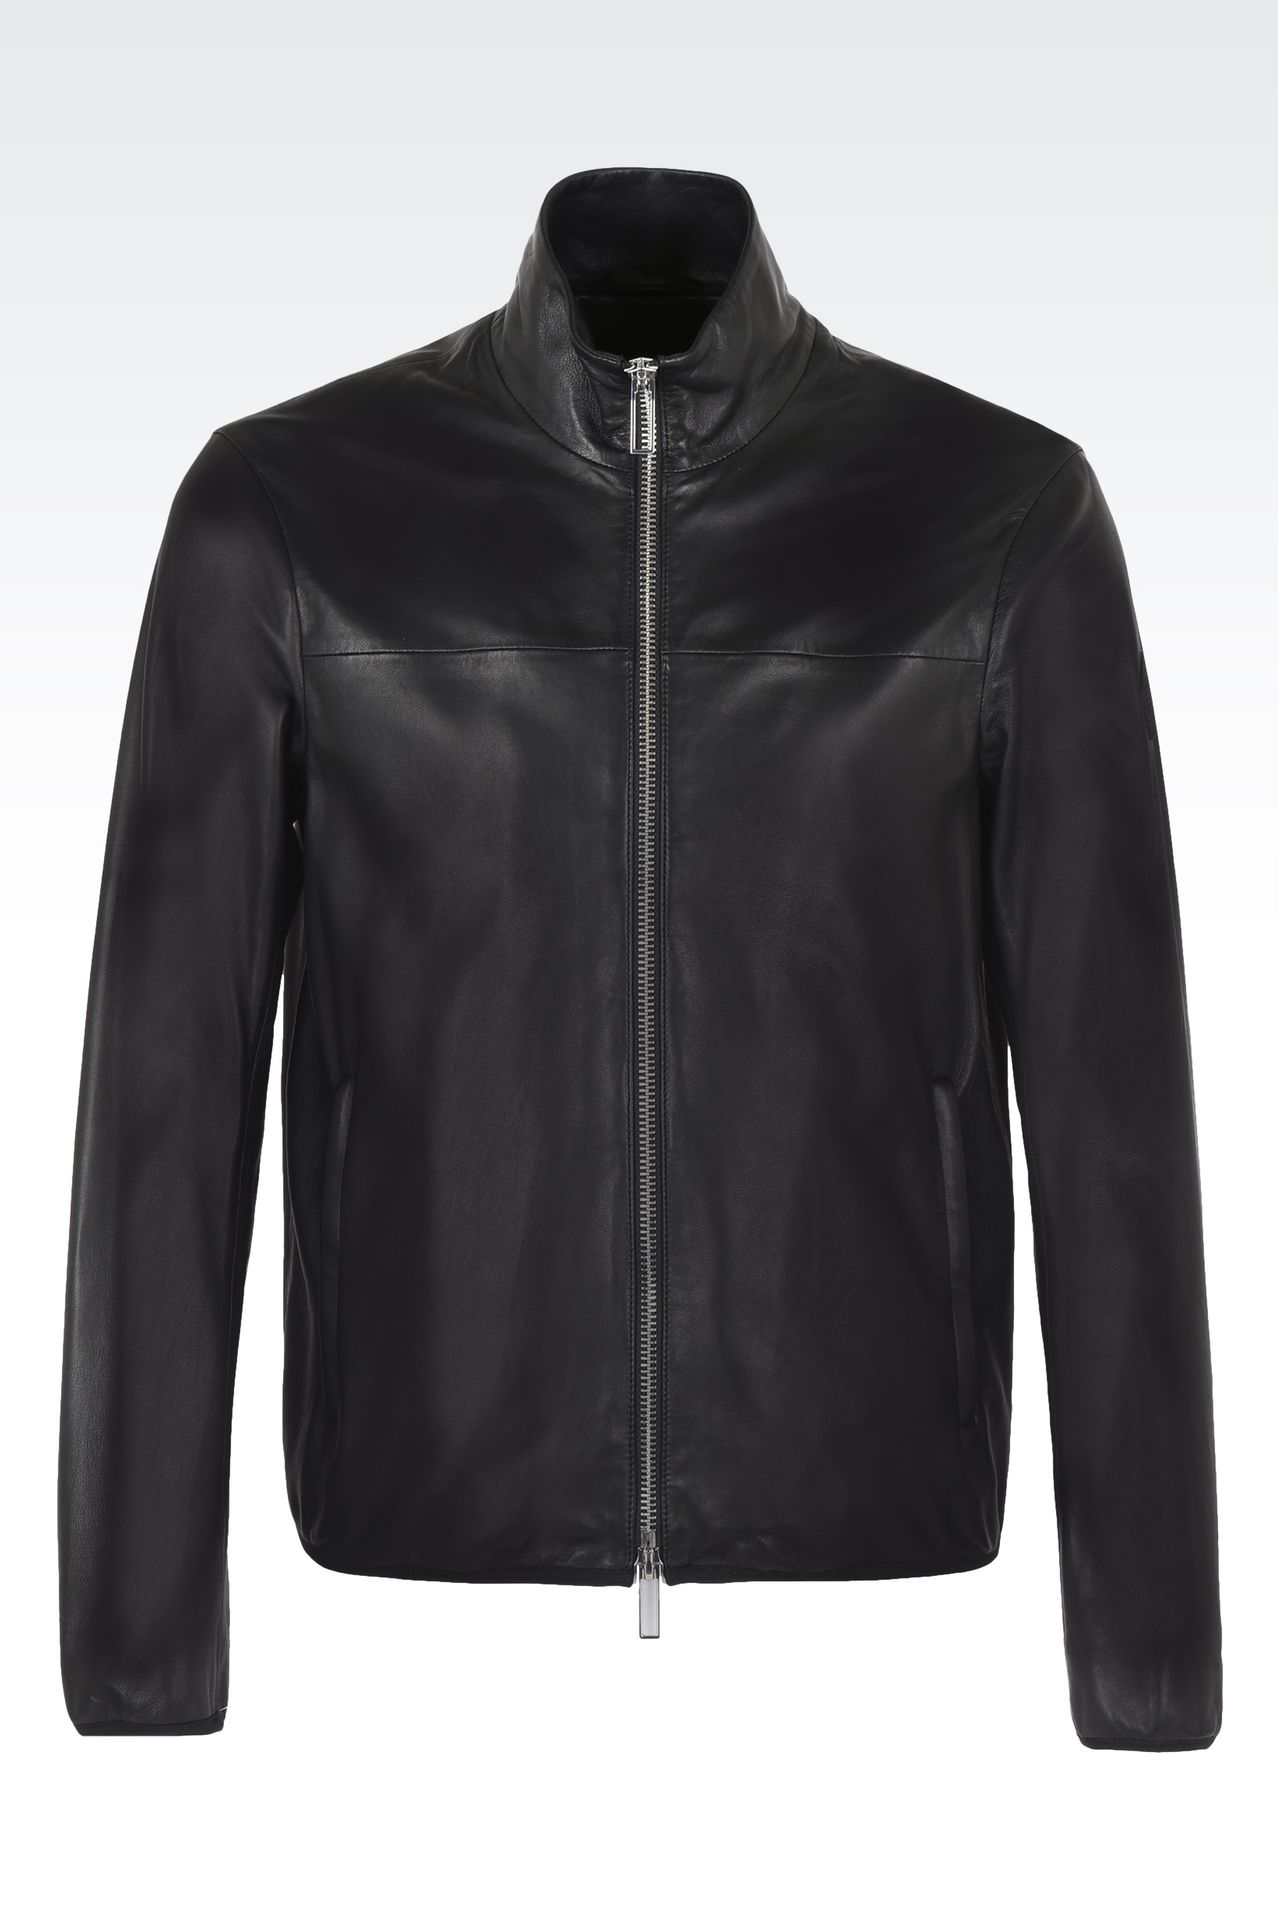 armani jackets outerwear: blouson jackets men by armani - 0 HBHNSKB